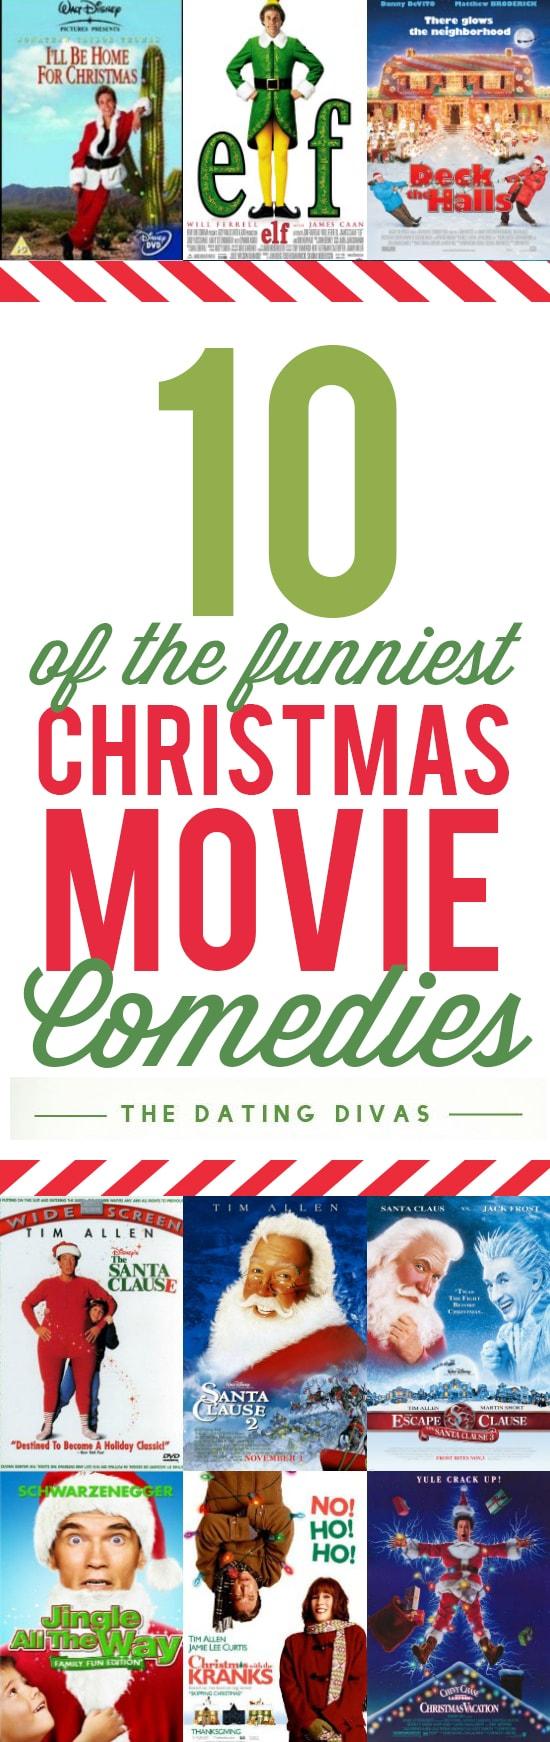 Christmas Movies Comedies